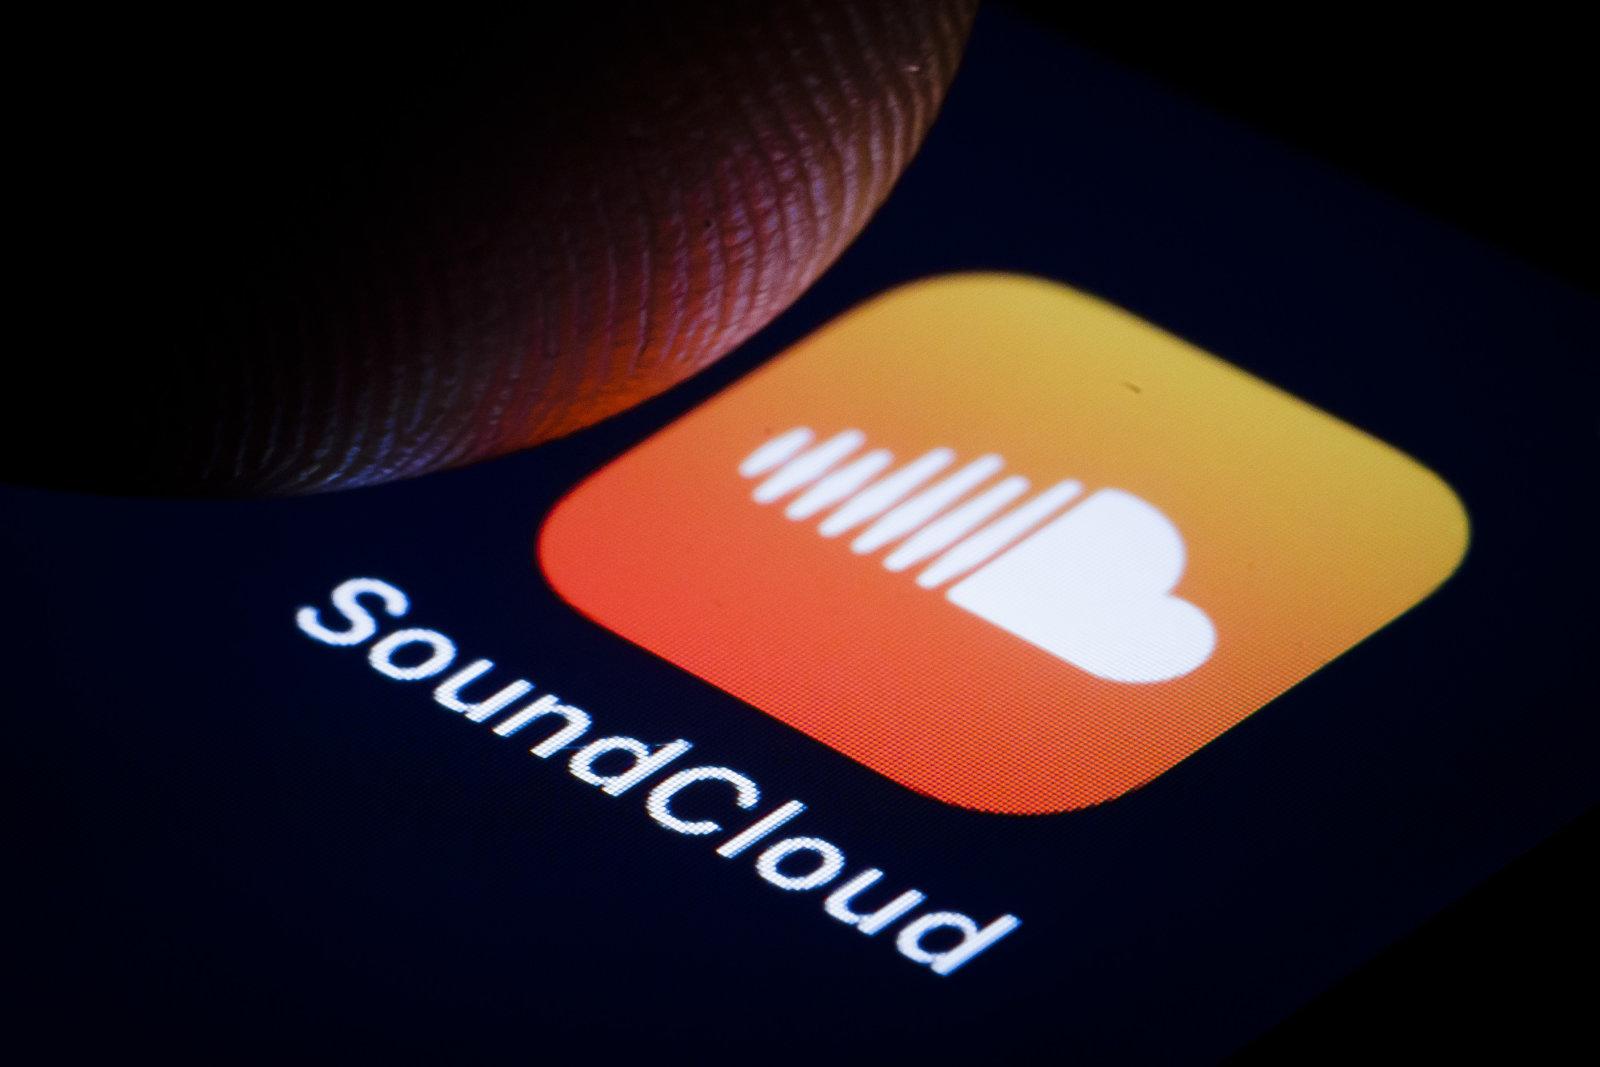 SoundCloud Plataformas de música en streaming Dynasonic